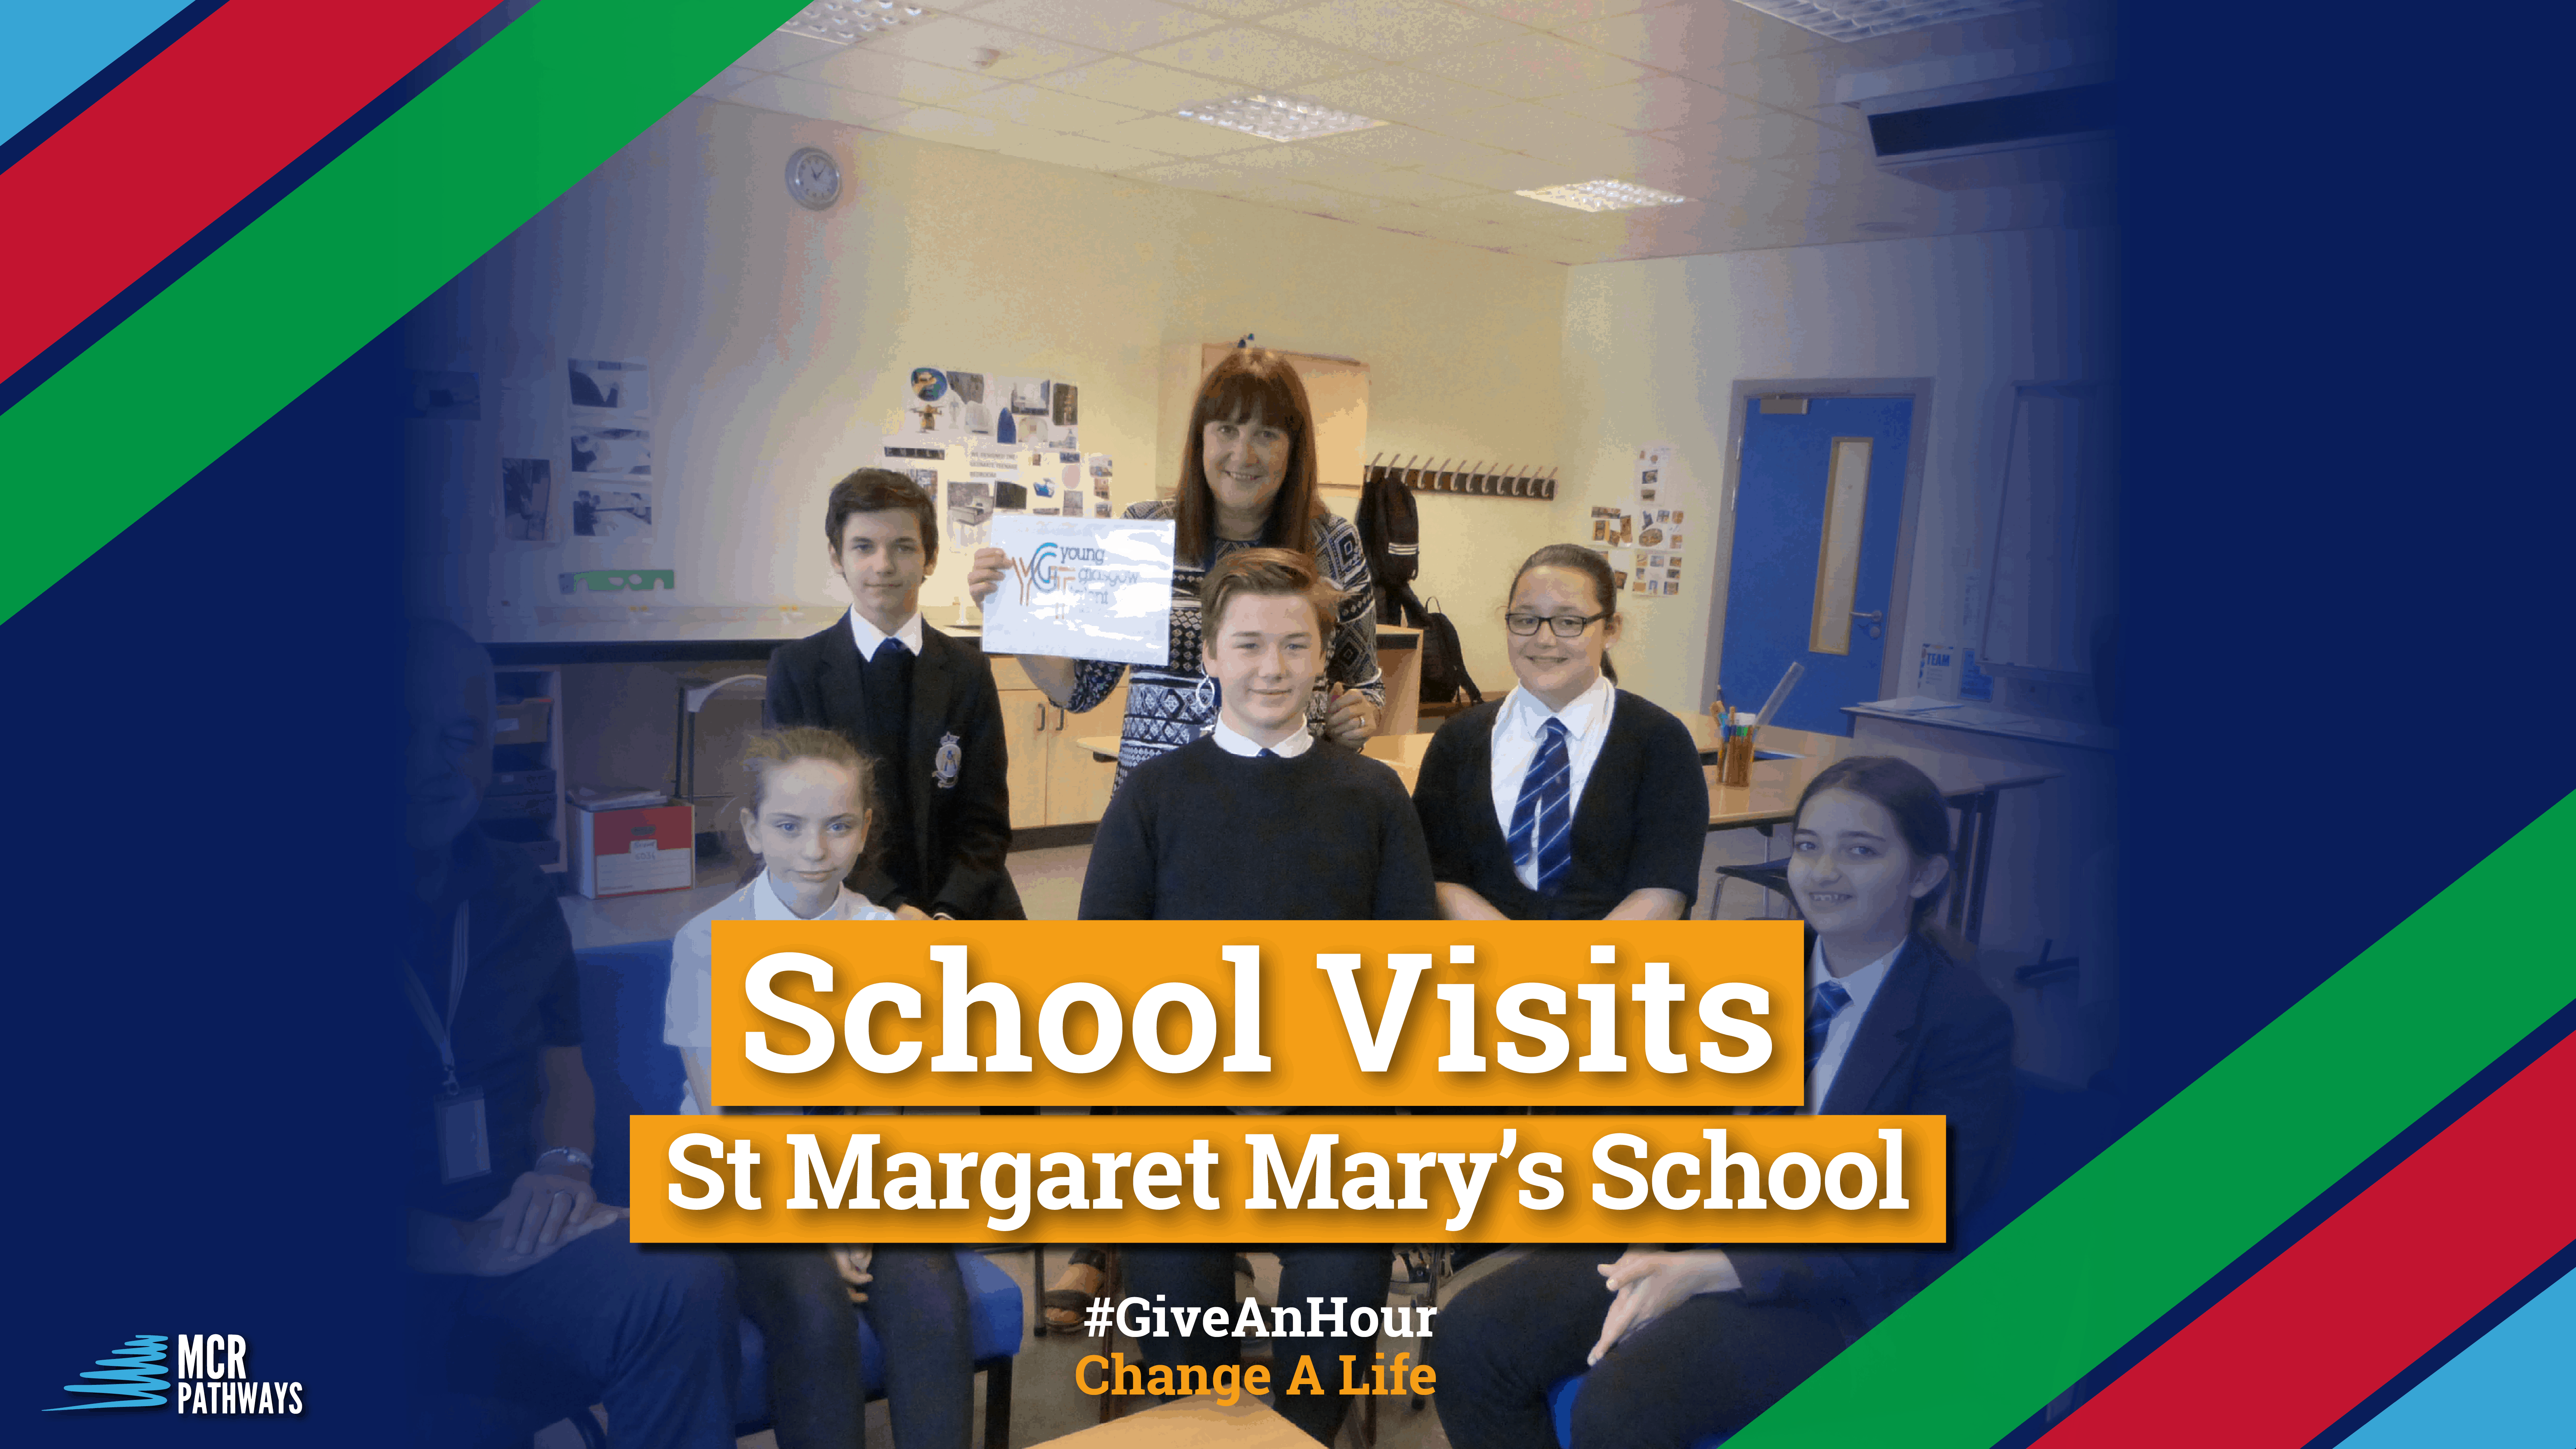 School Visits St Margaret Mary's School